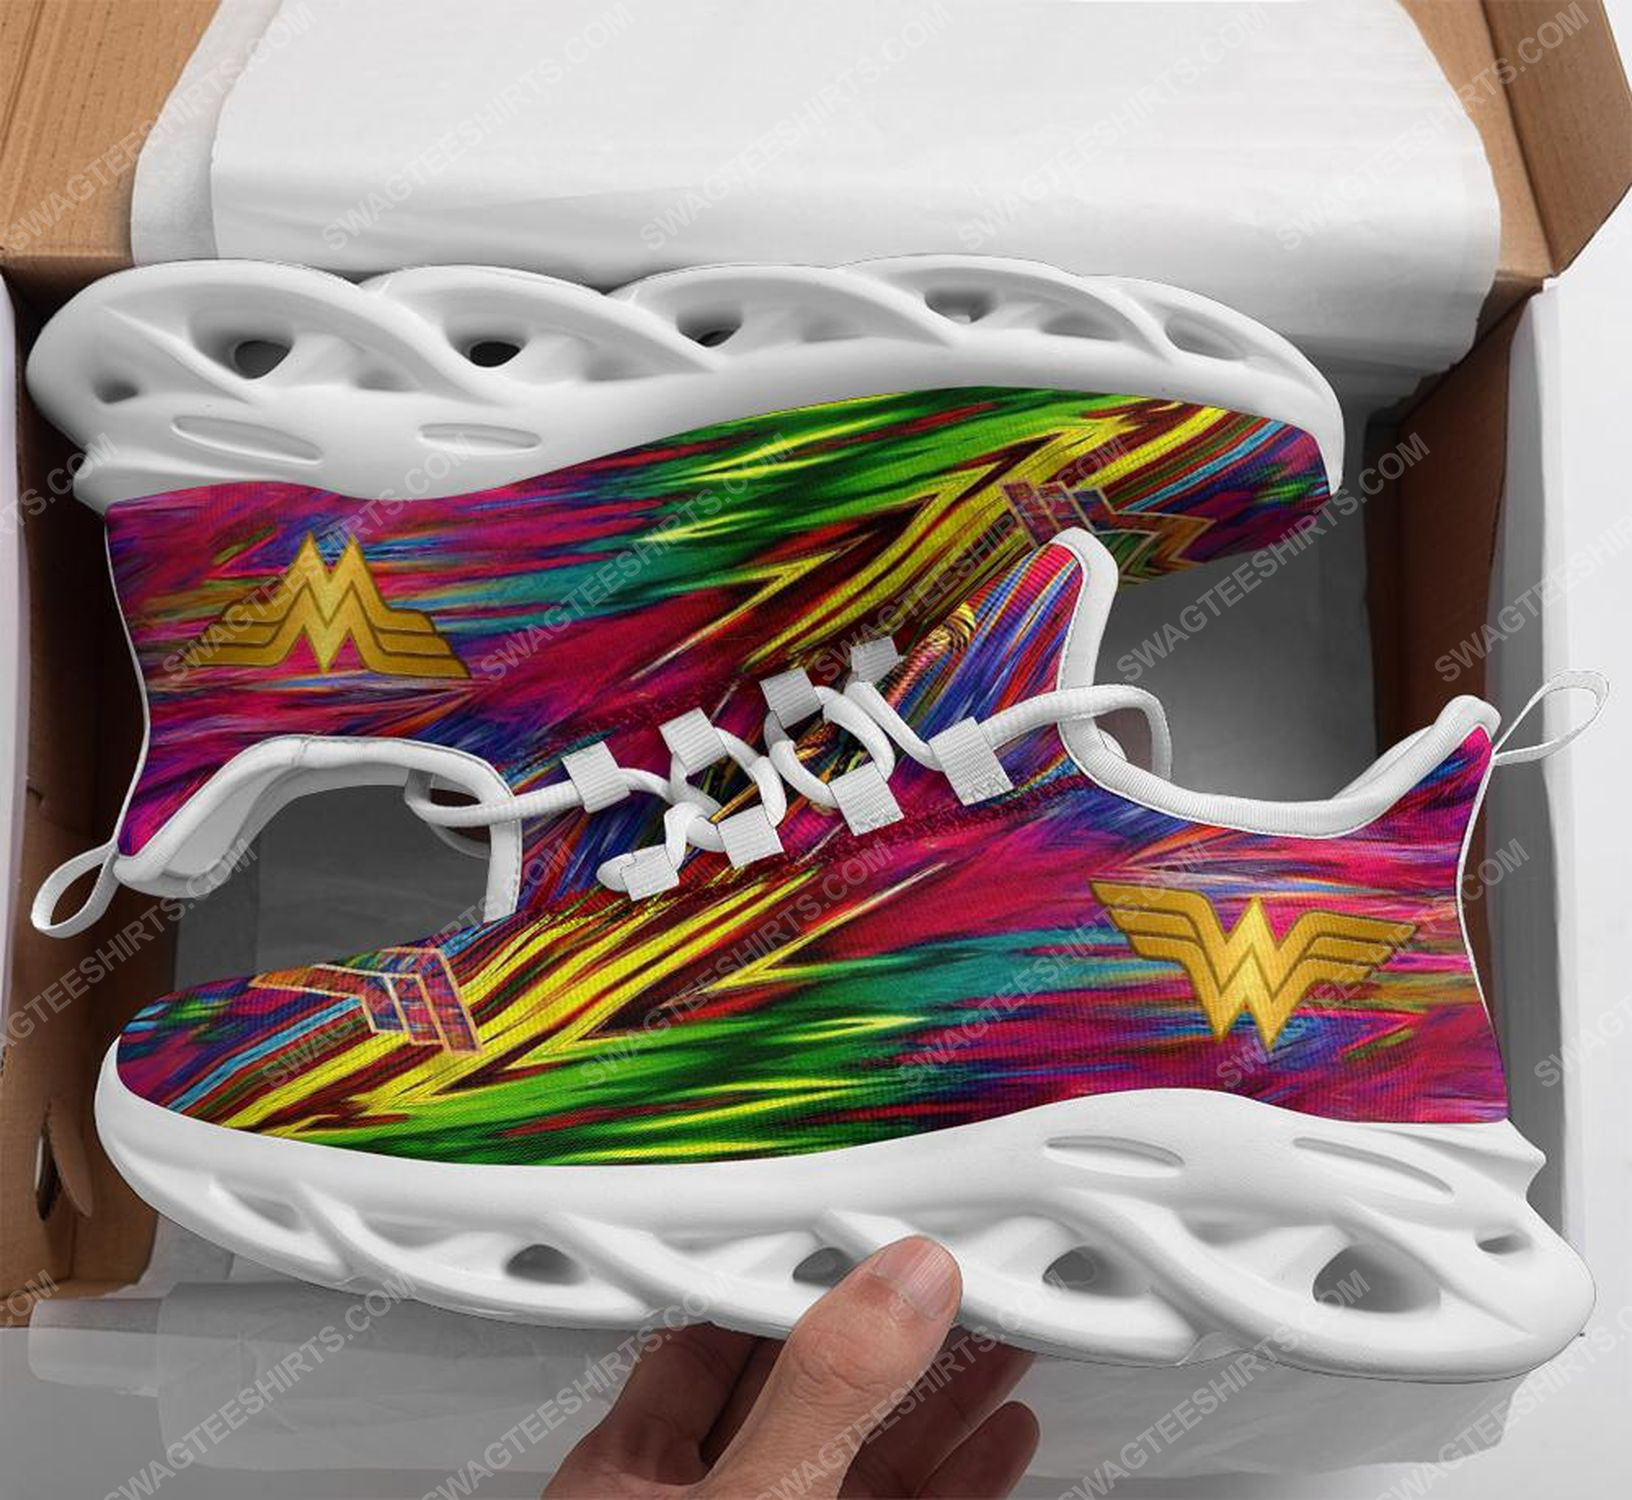 DC wonder woman movie max soul shoes 1